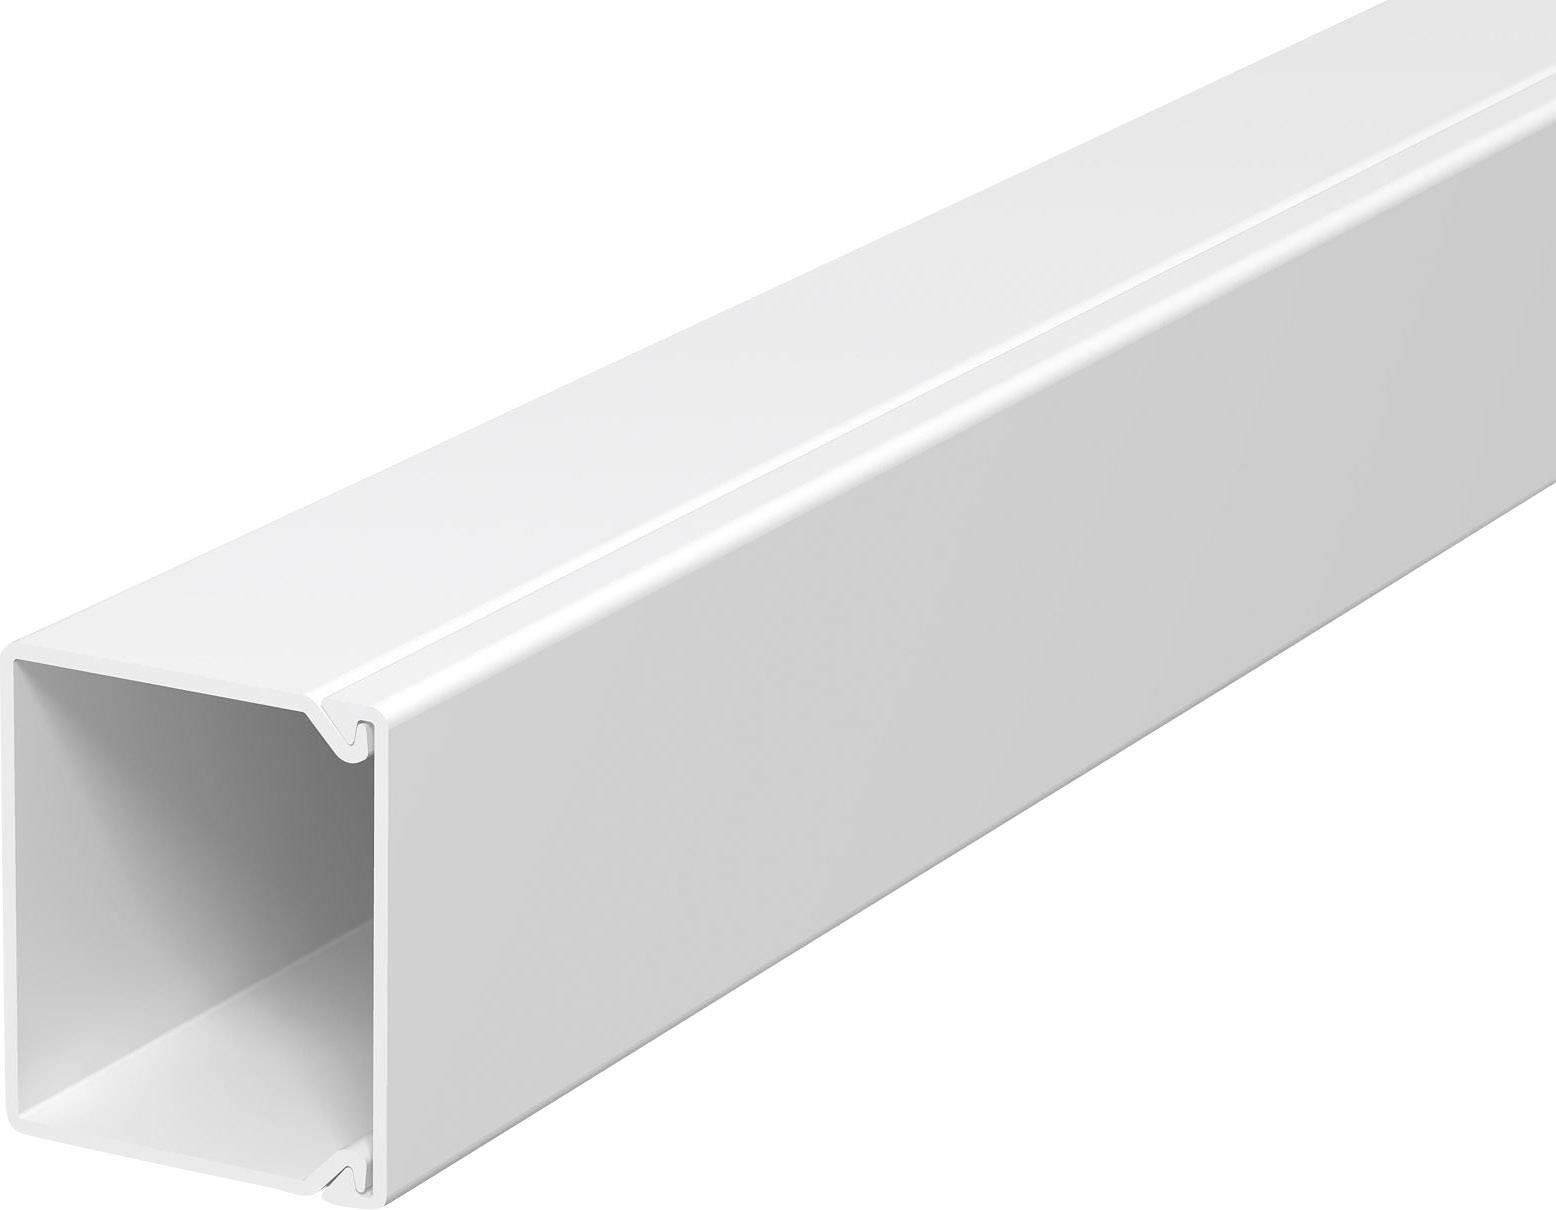 Elektroinstalační lišta s krytem OBO Bettermann, 6189547, 40 x 40 mm, 2 m, bílá